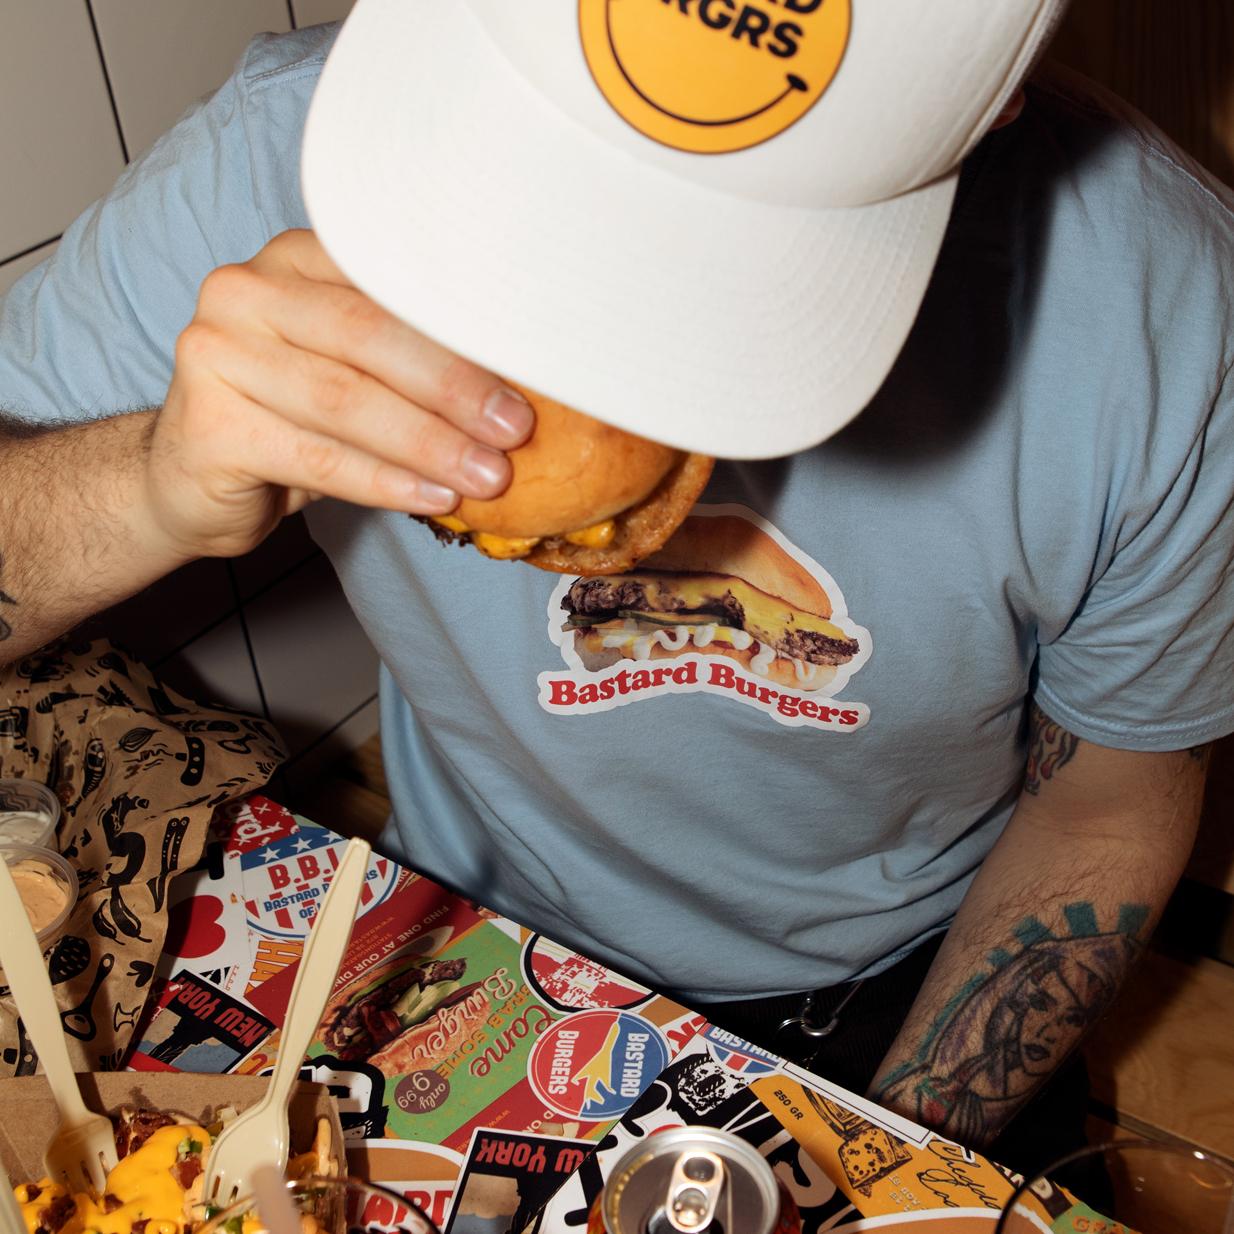 The Burger image